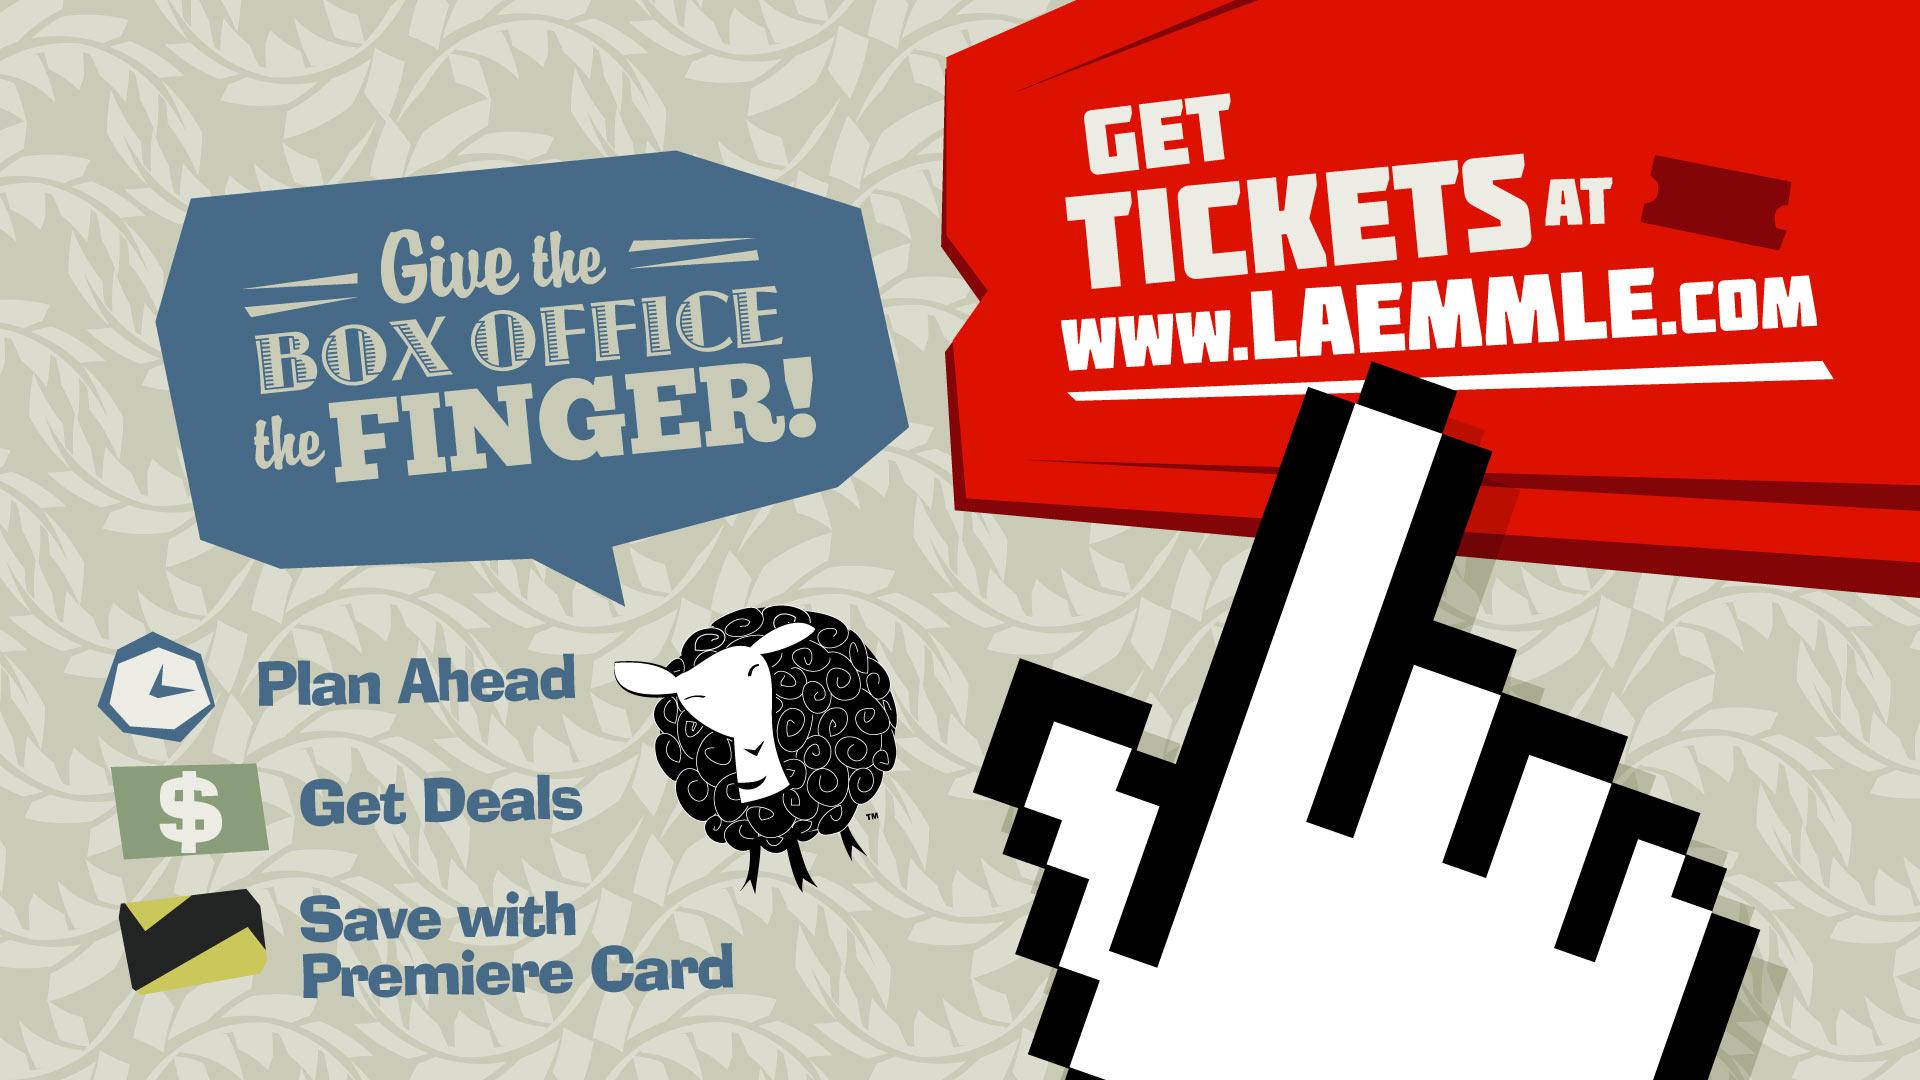 Laemmle_TheaterSlides_Branded_GetTickets2.jpg